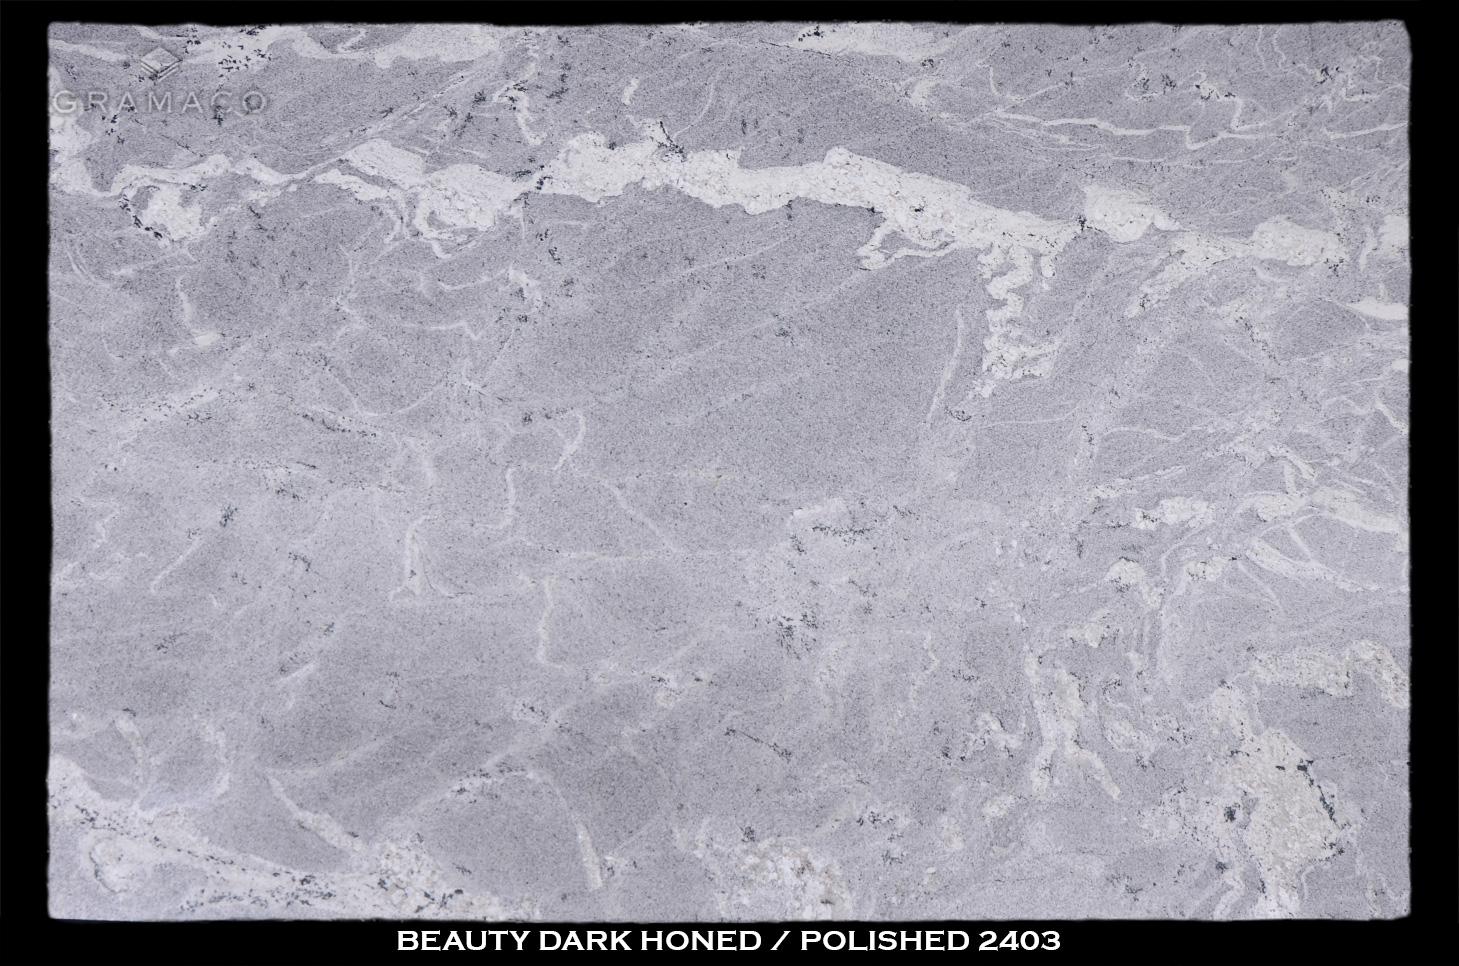 BEAUTY-DARK-HONED-POLISHED-2403-SLAB